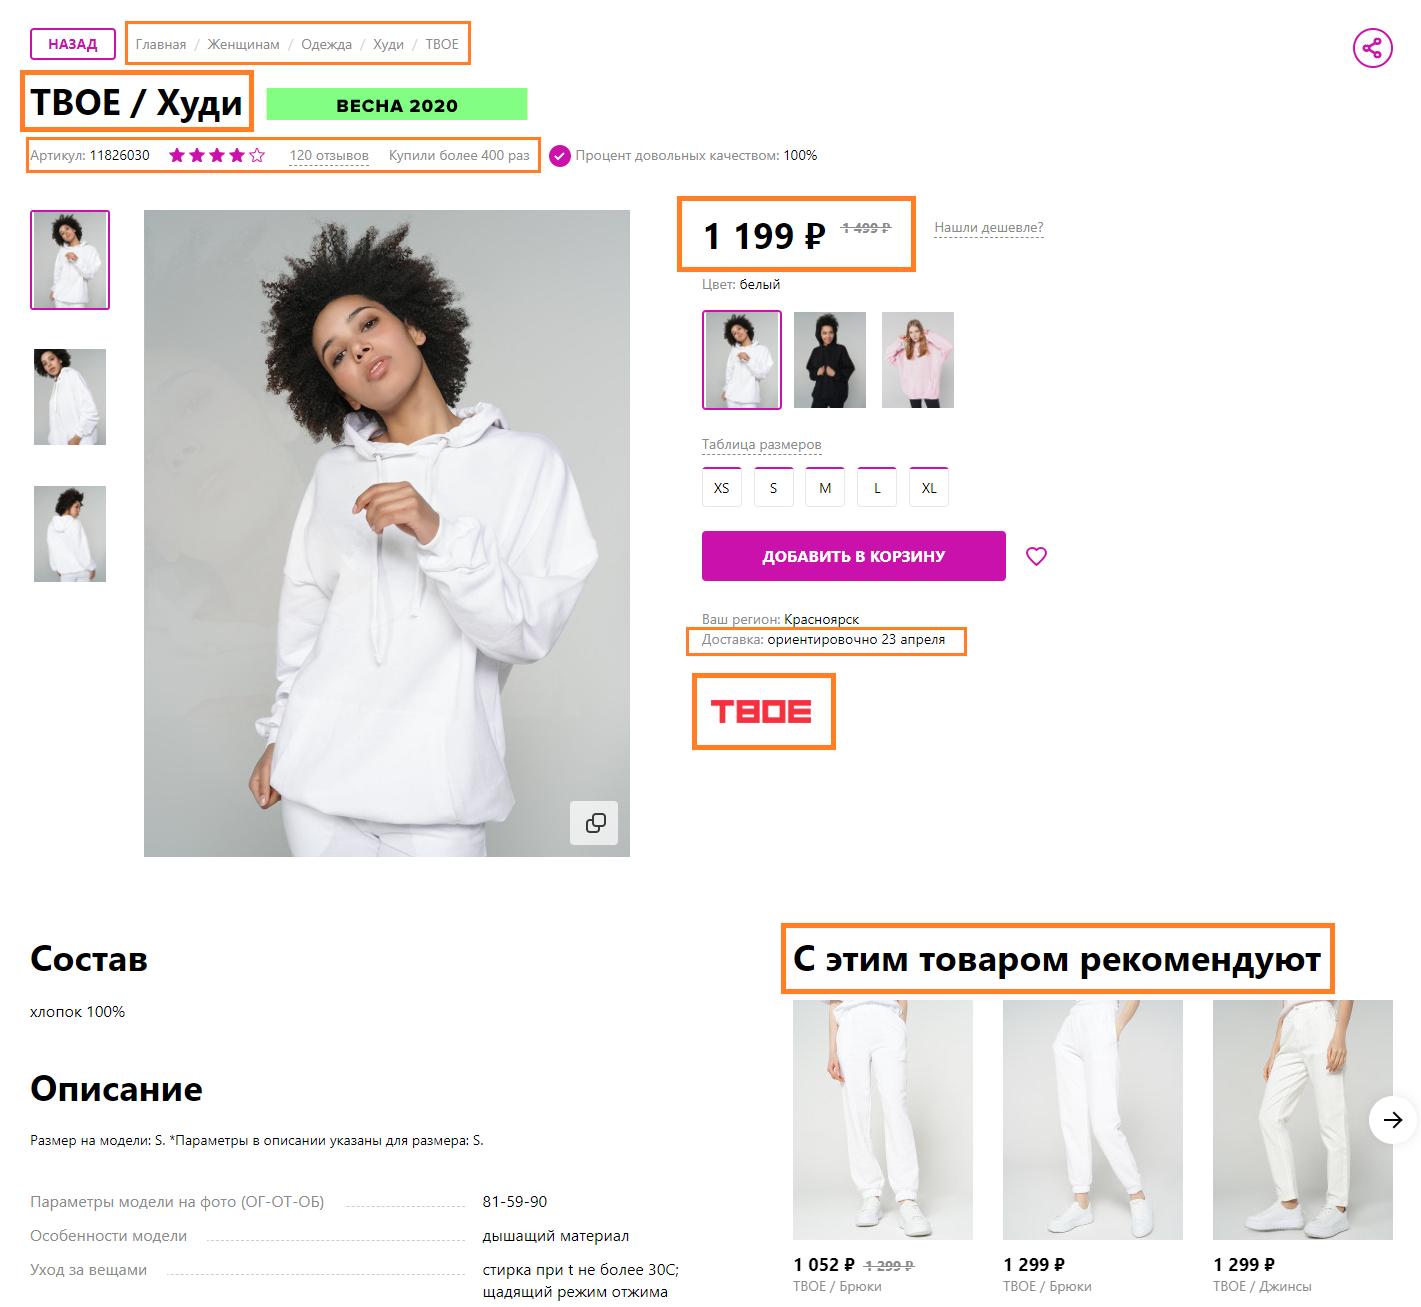 Пример парсинга данных с сайта Wildberries.ru